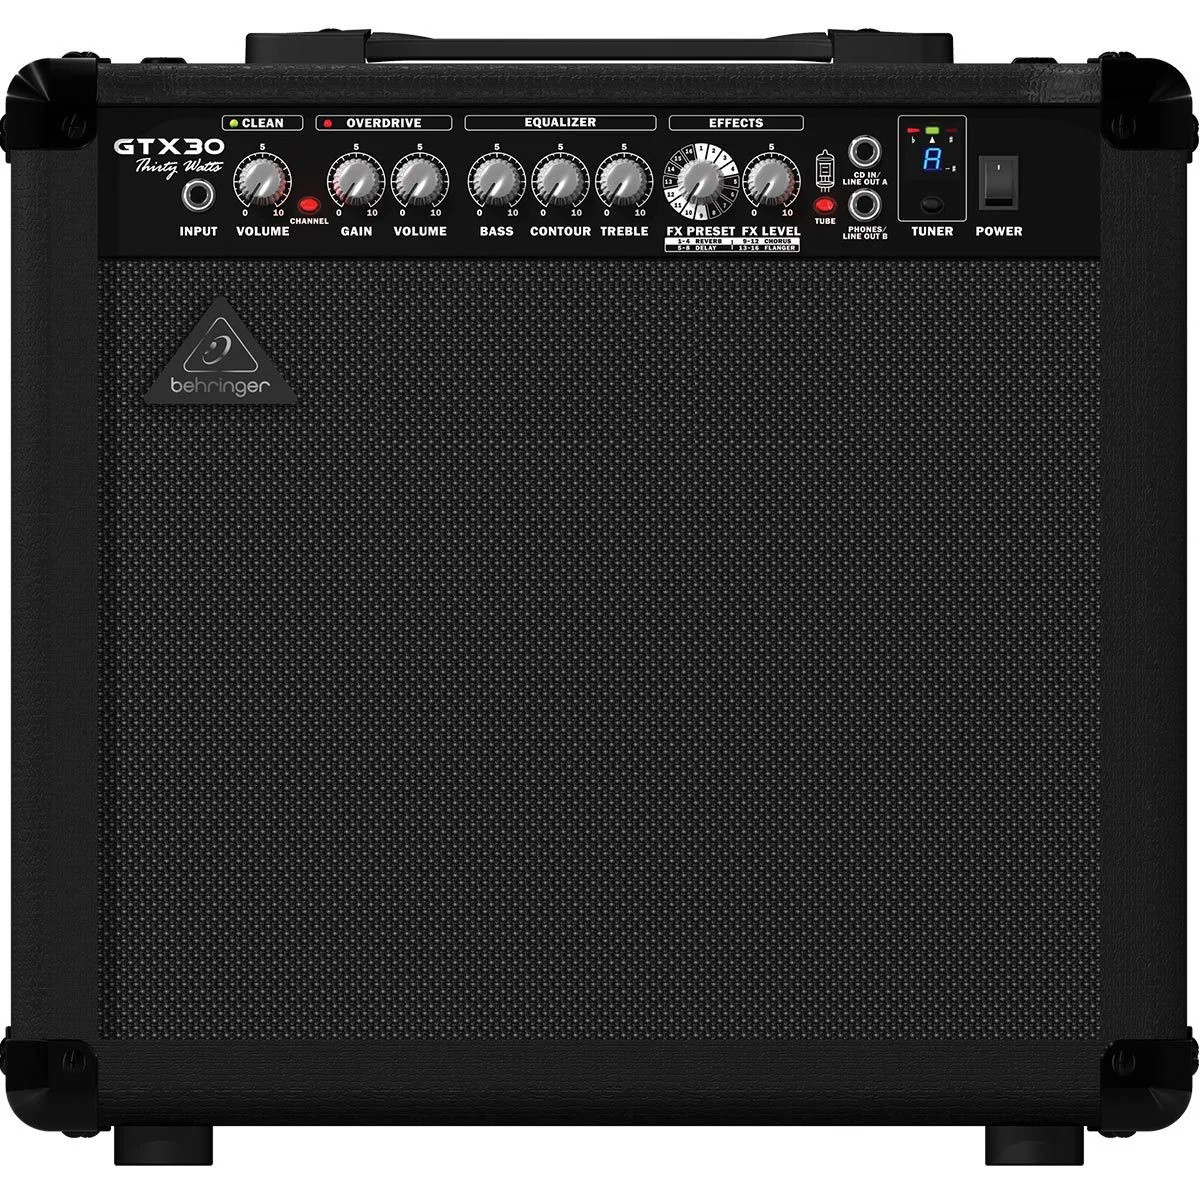 Caixa Amplificada Behringer GTX30 30W 1x12